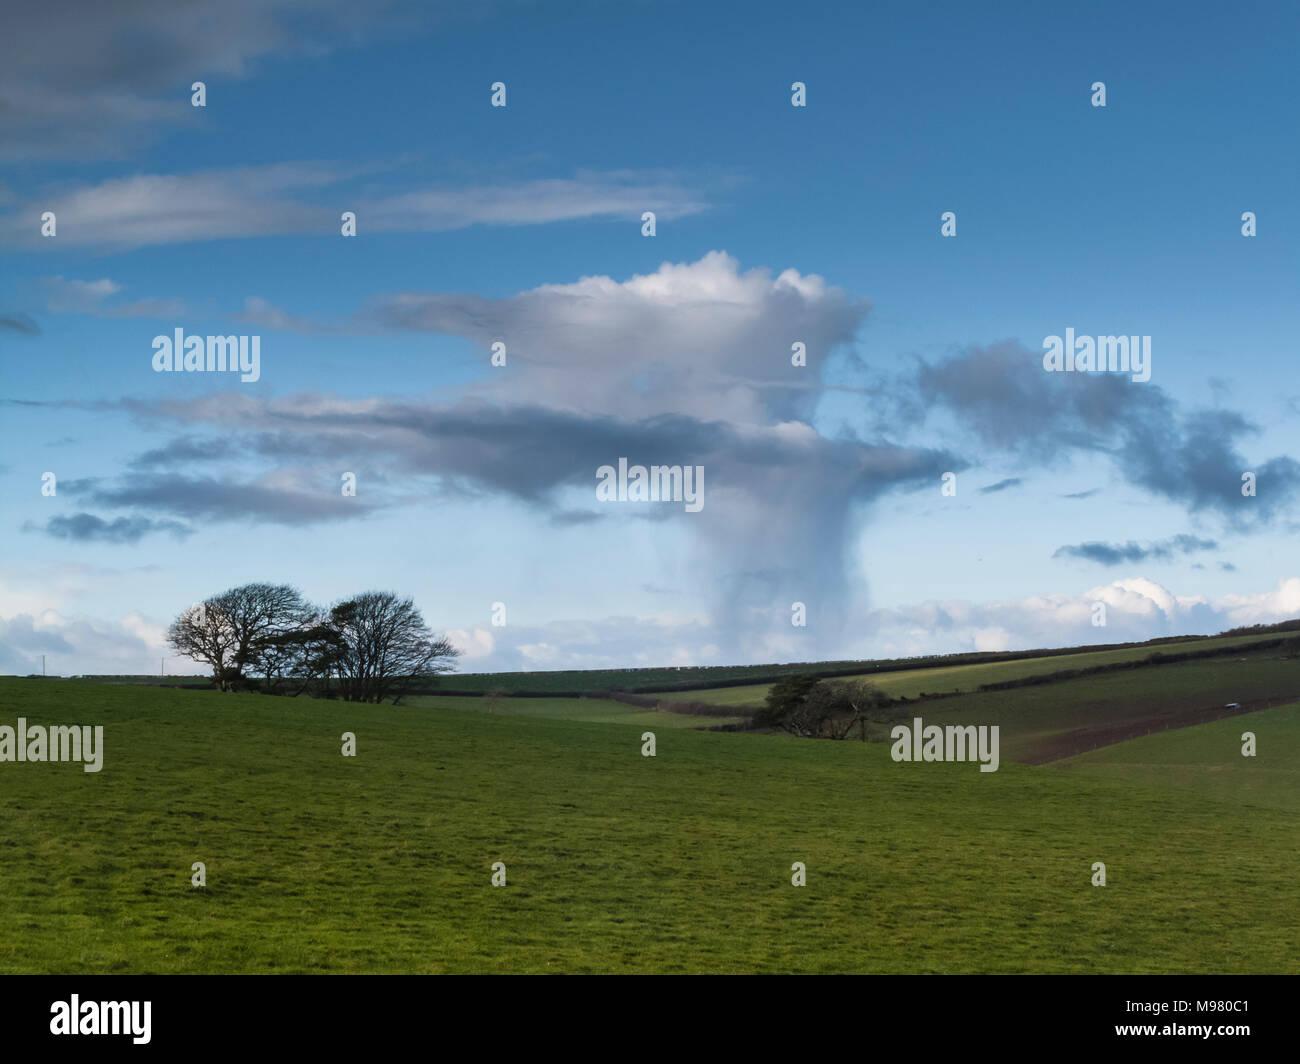 Raincloud and rain shower over Dorset landscape - Stock Image